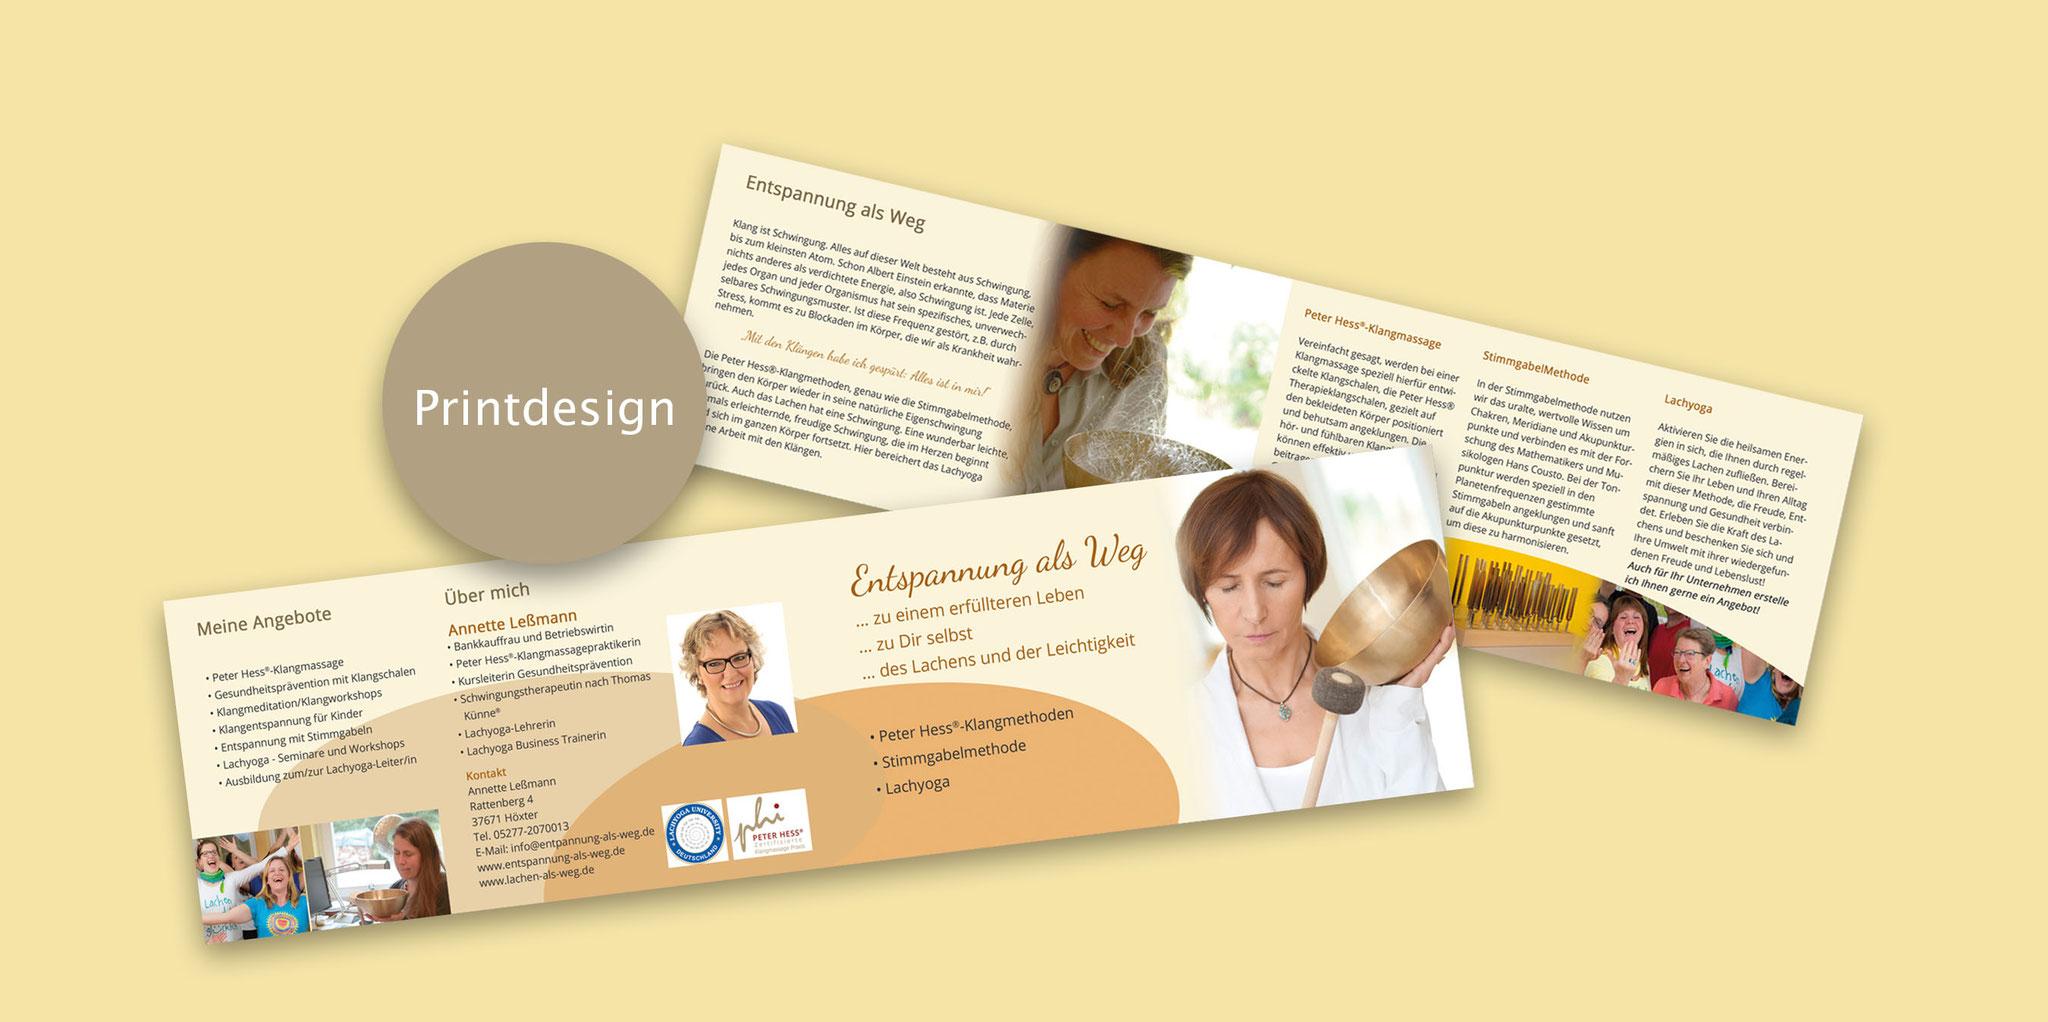 Corporate Design, Print Design, Web Design: www.entspannung-als-weg.de